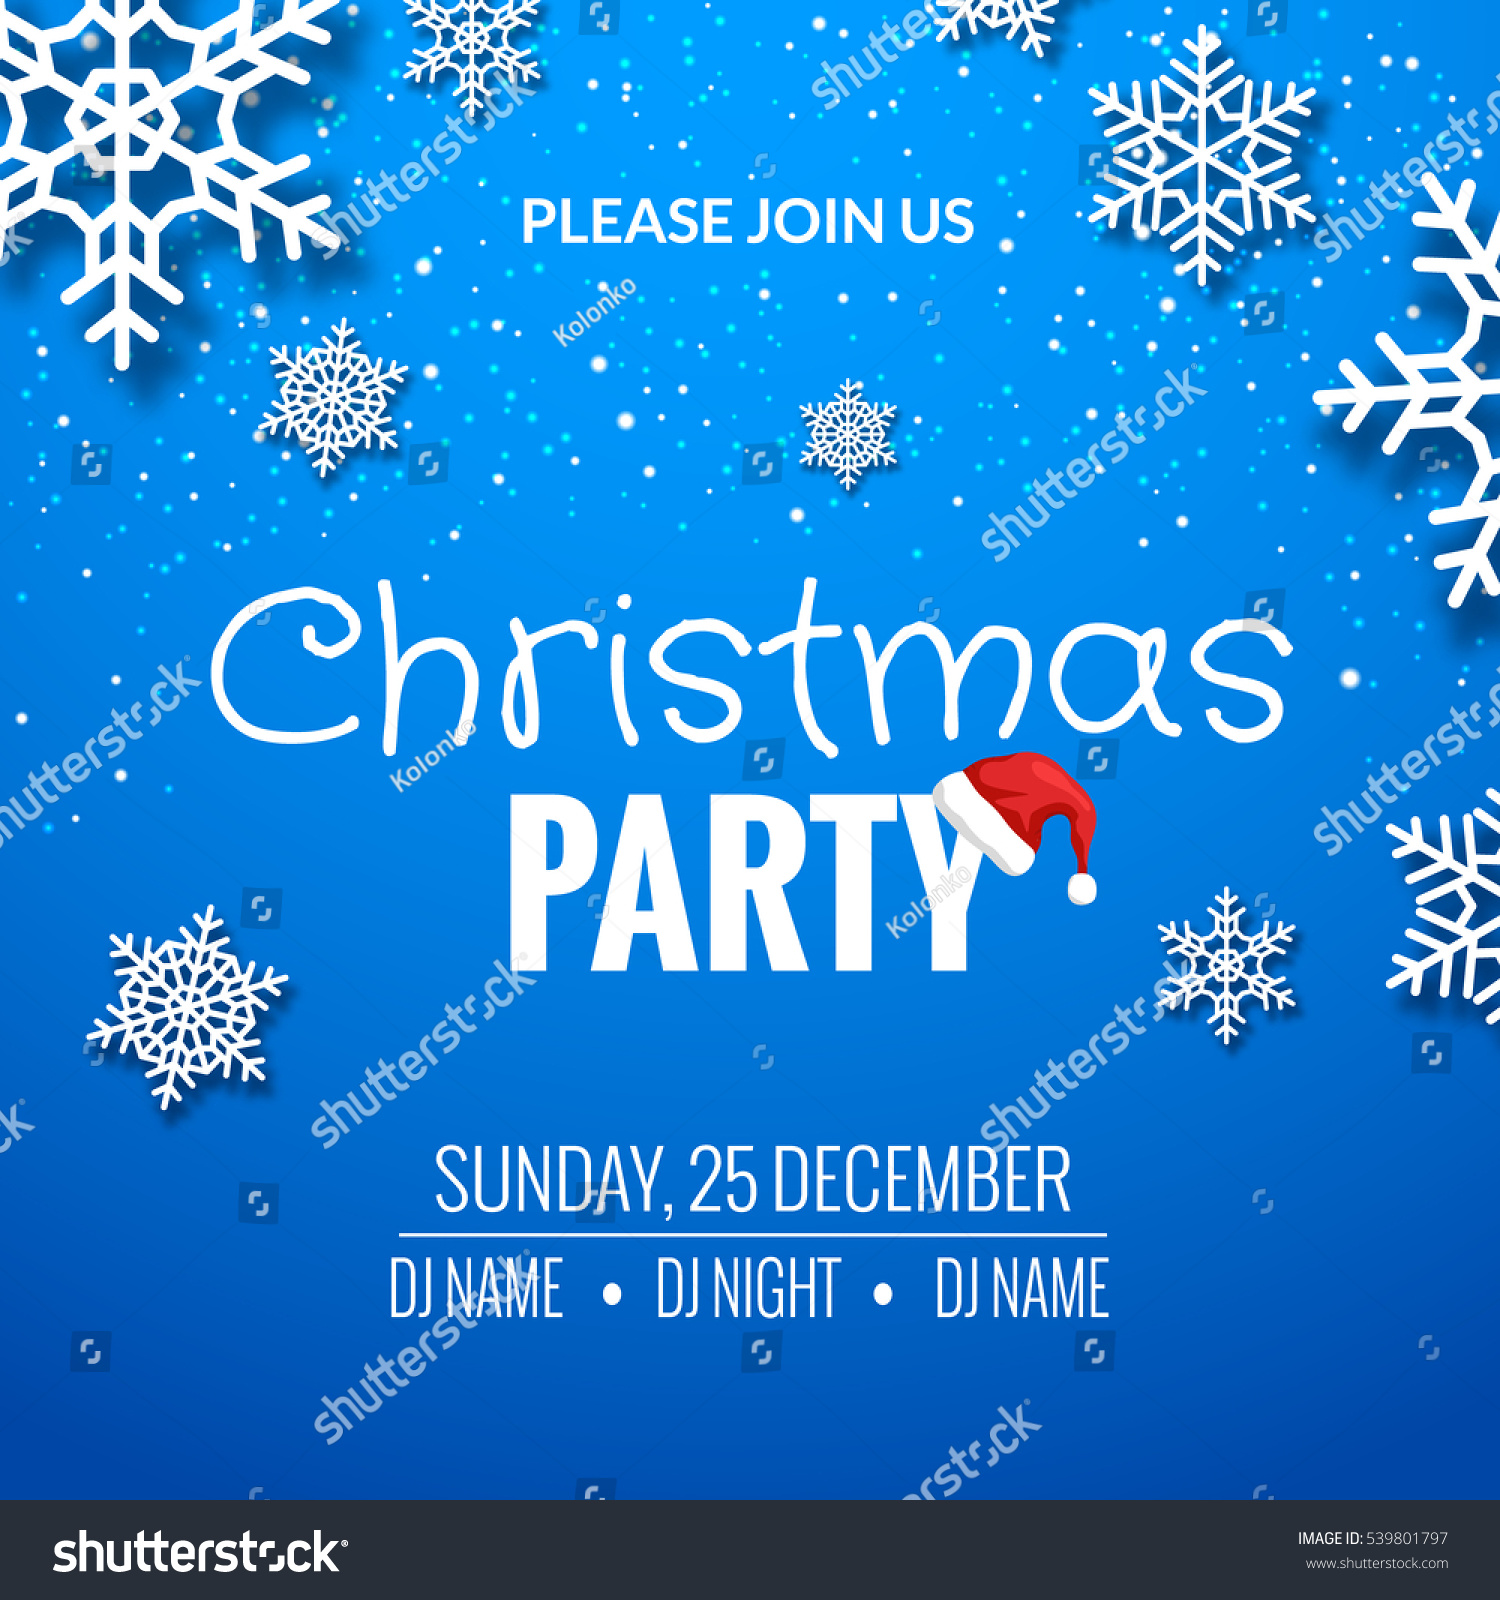 Christmas Party Invitation Poster Design Retro Stock Vector ...